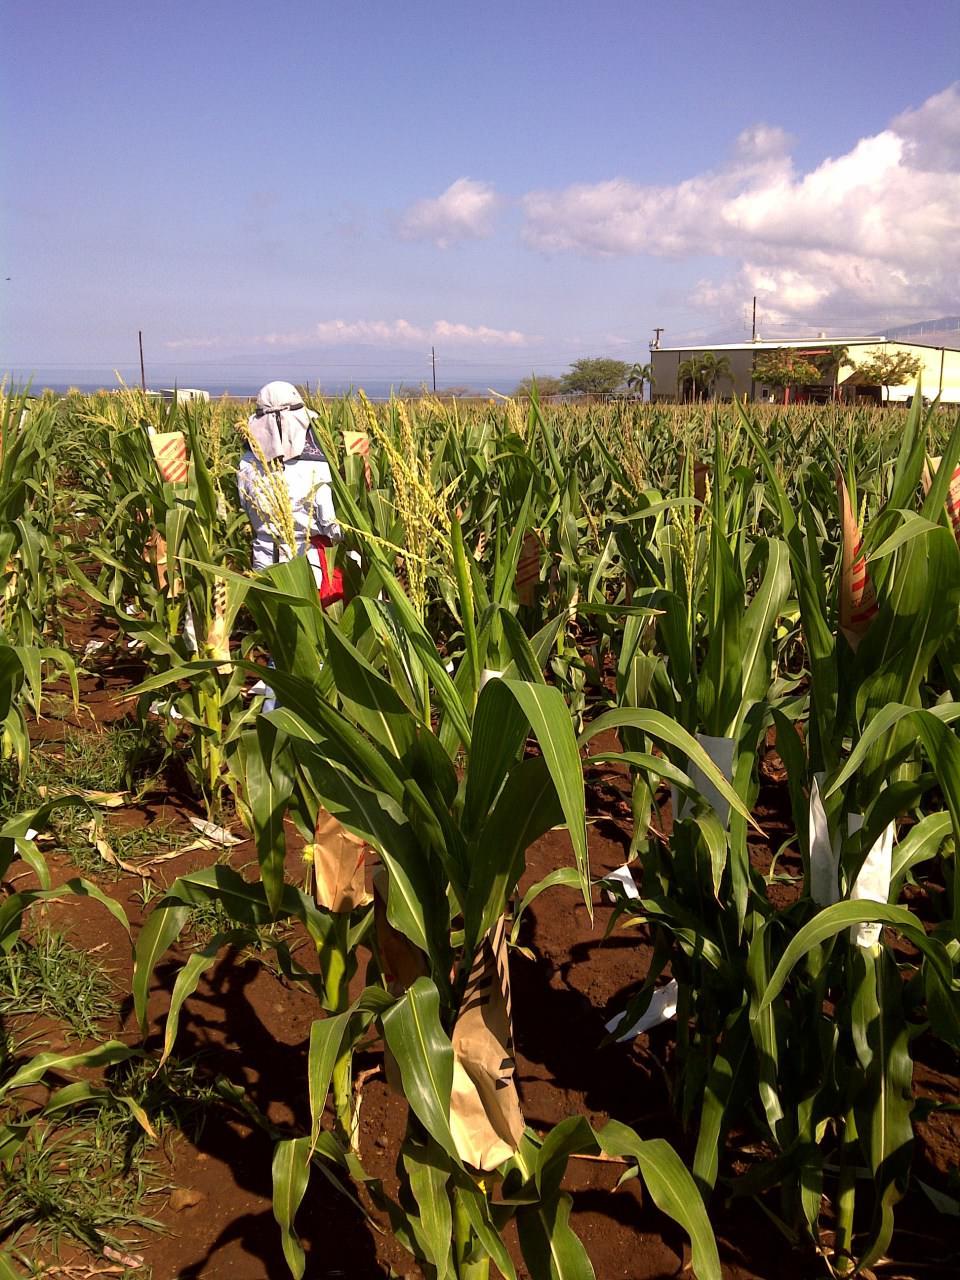 A Libertarian Visits Monsanto